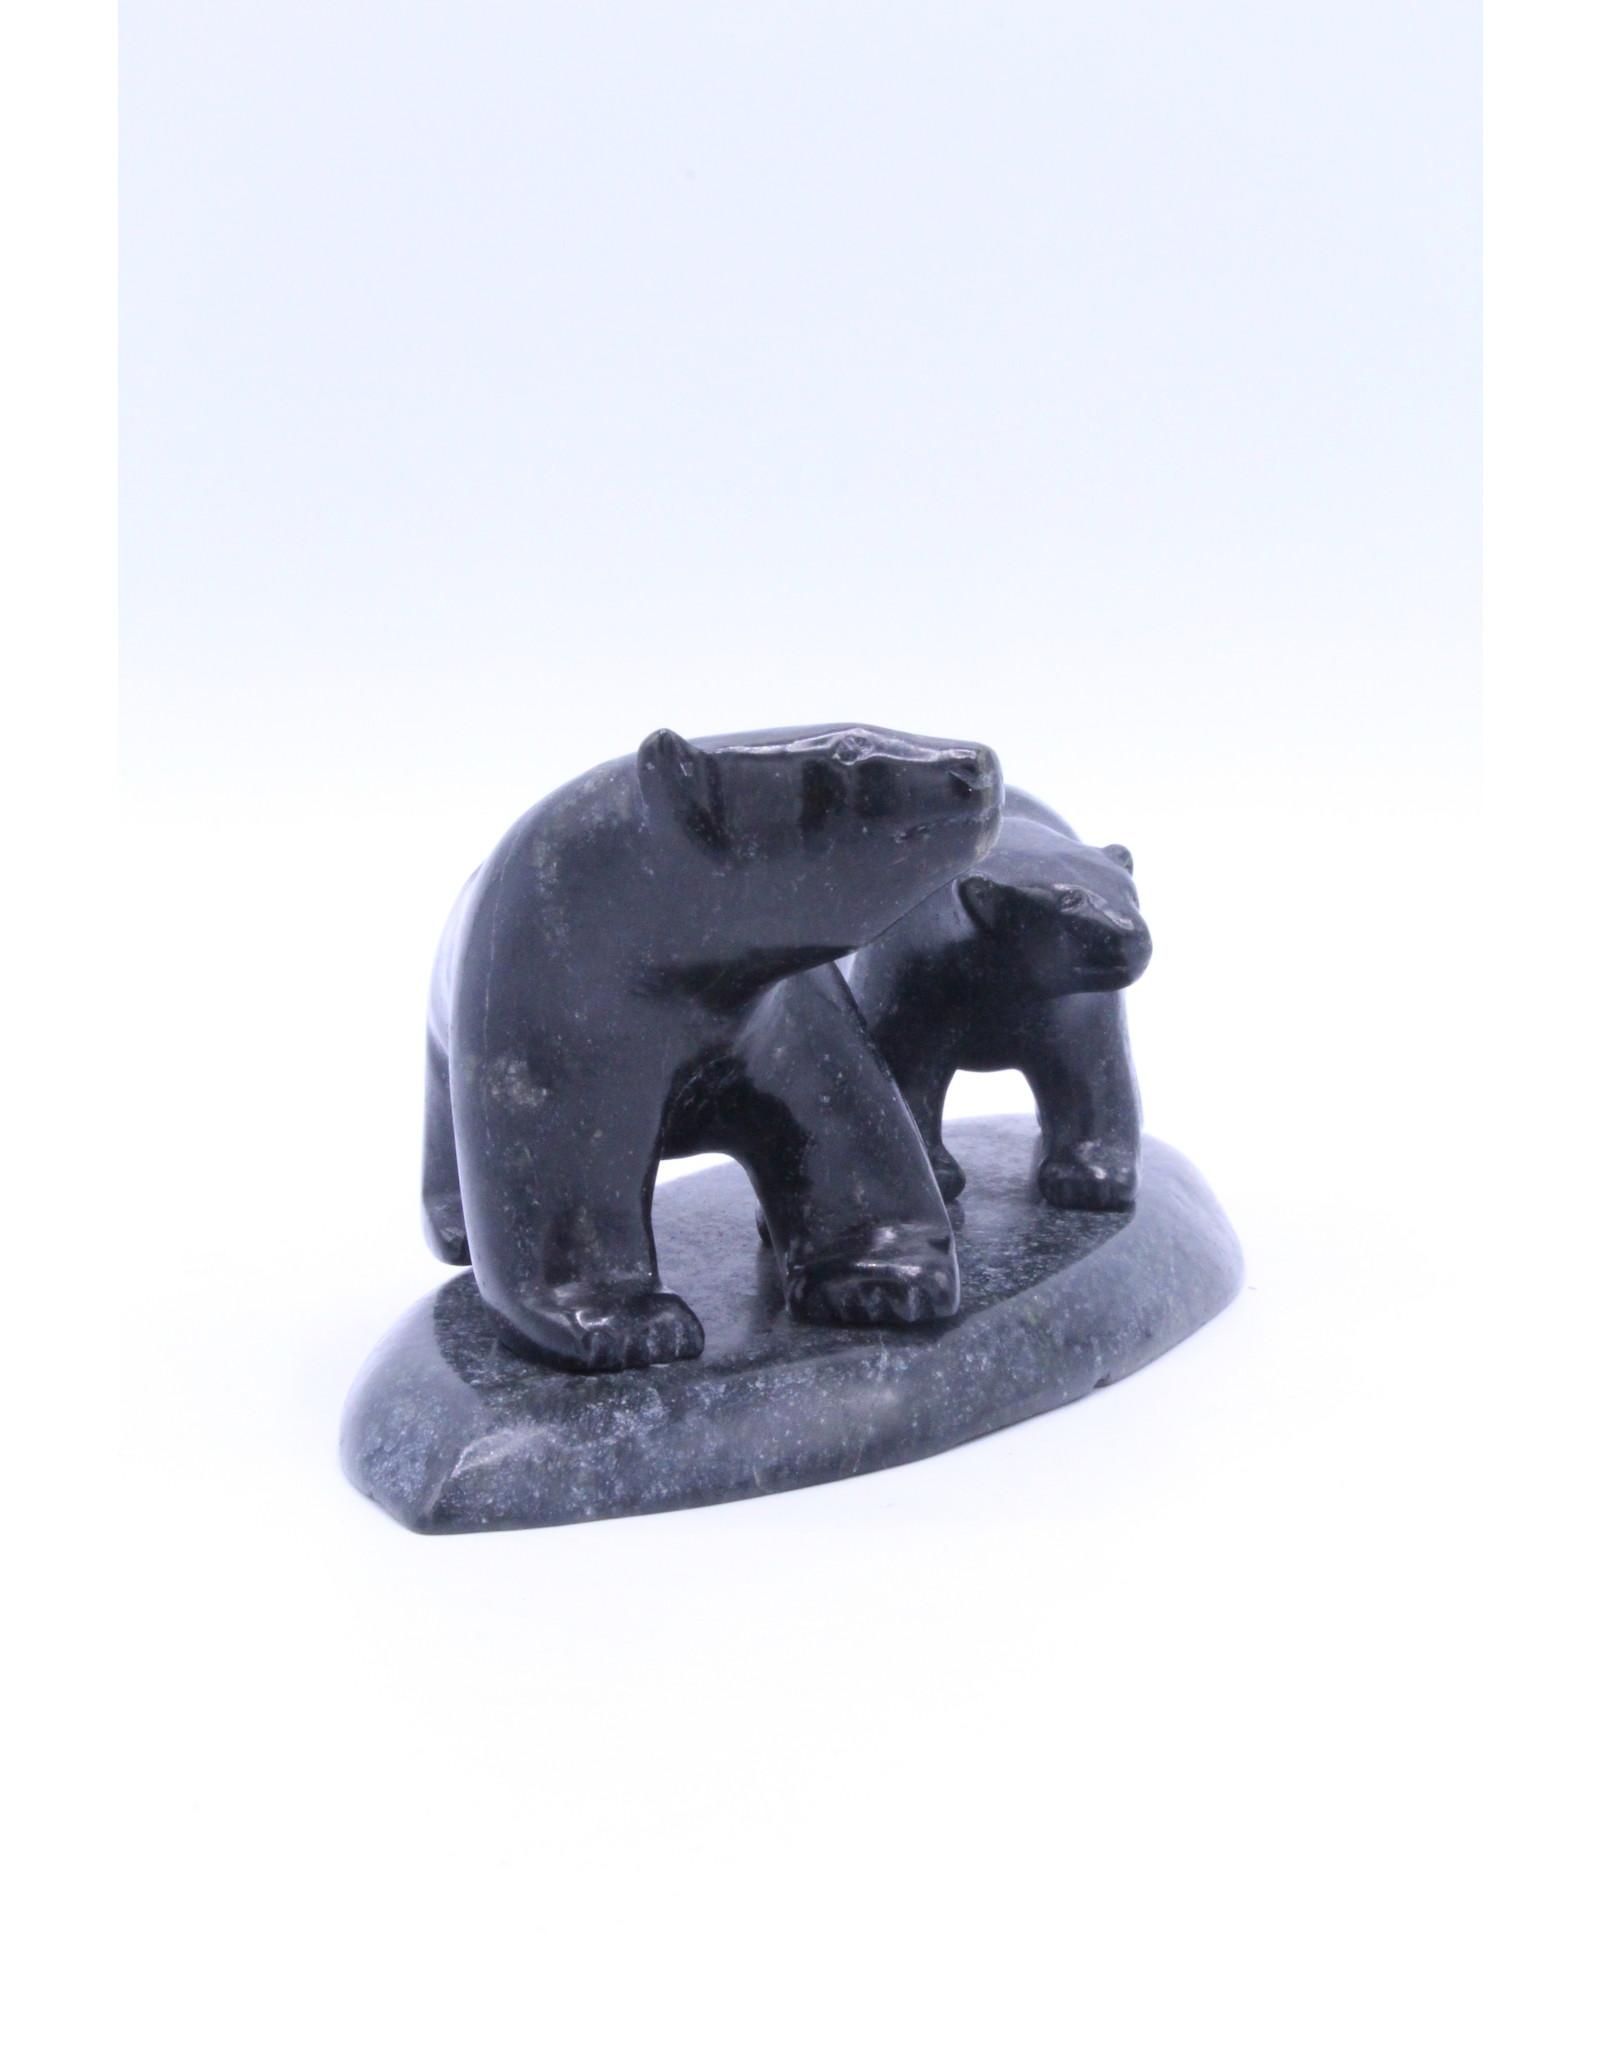 Two Bears by Siutiapik Ragee - 821004042